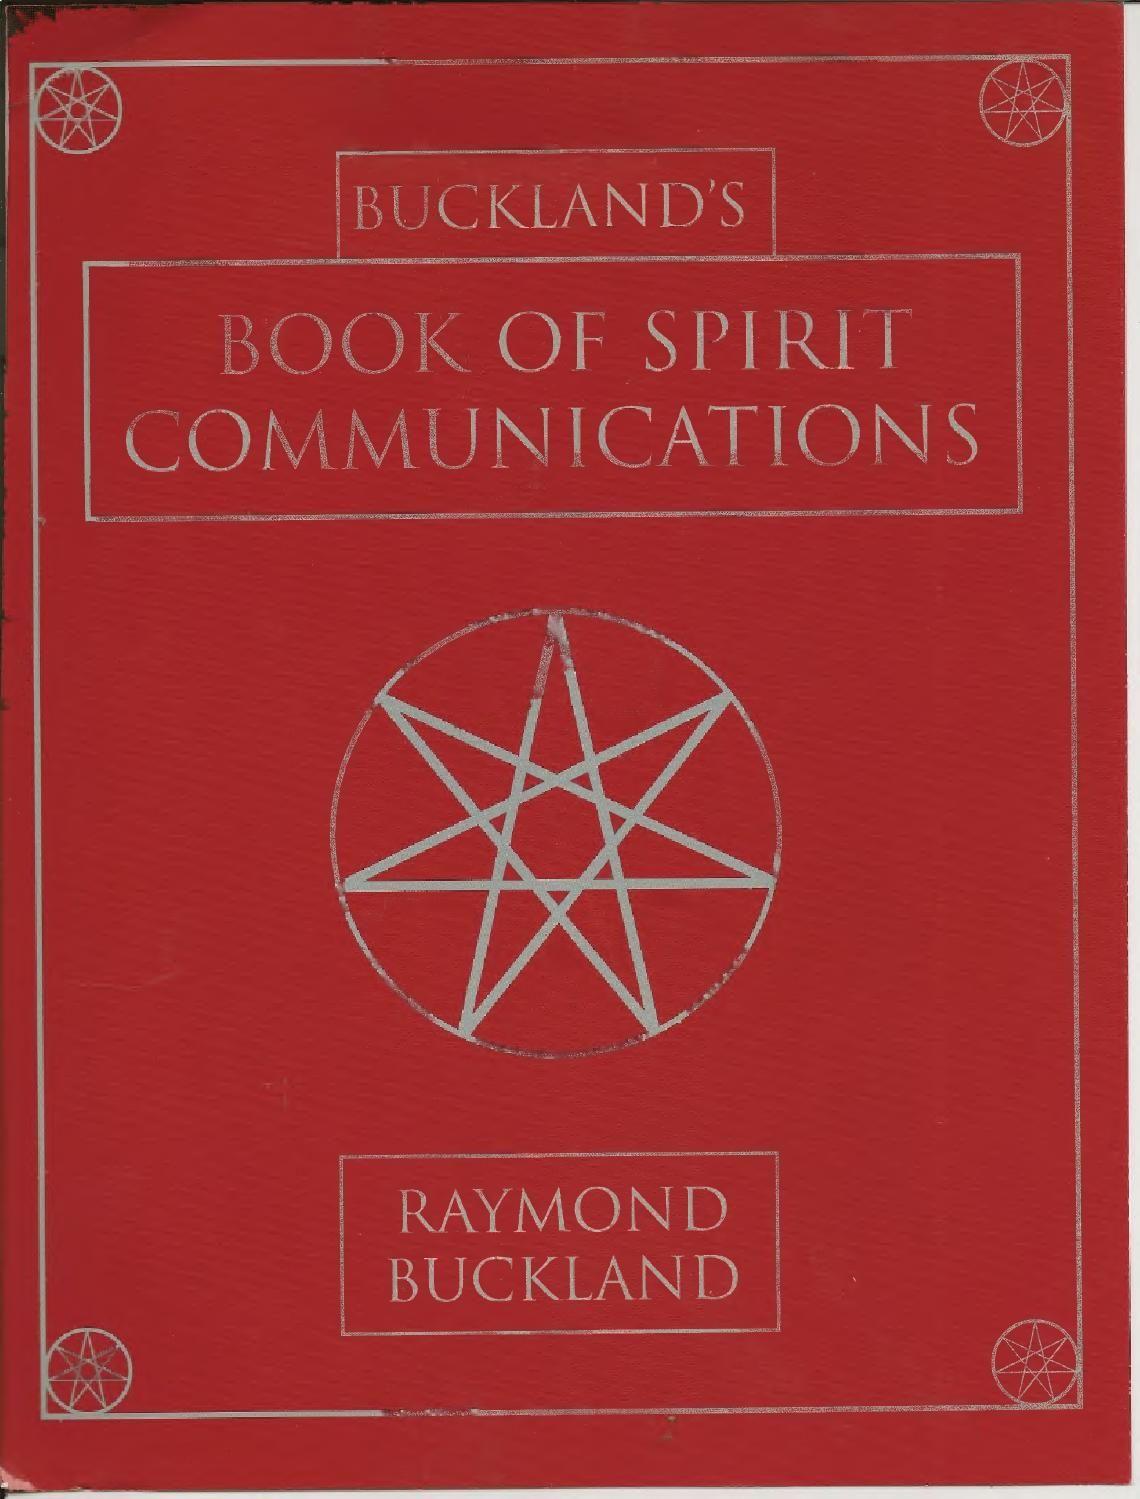 Book of spirit communications spirit communication